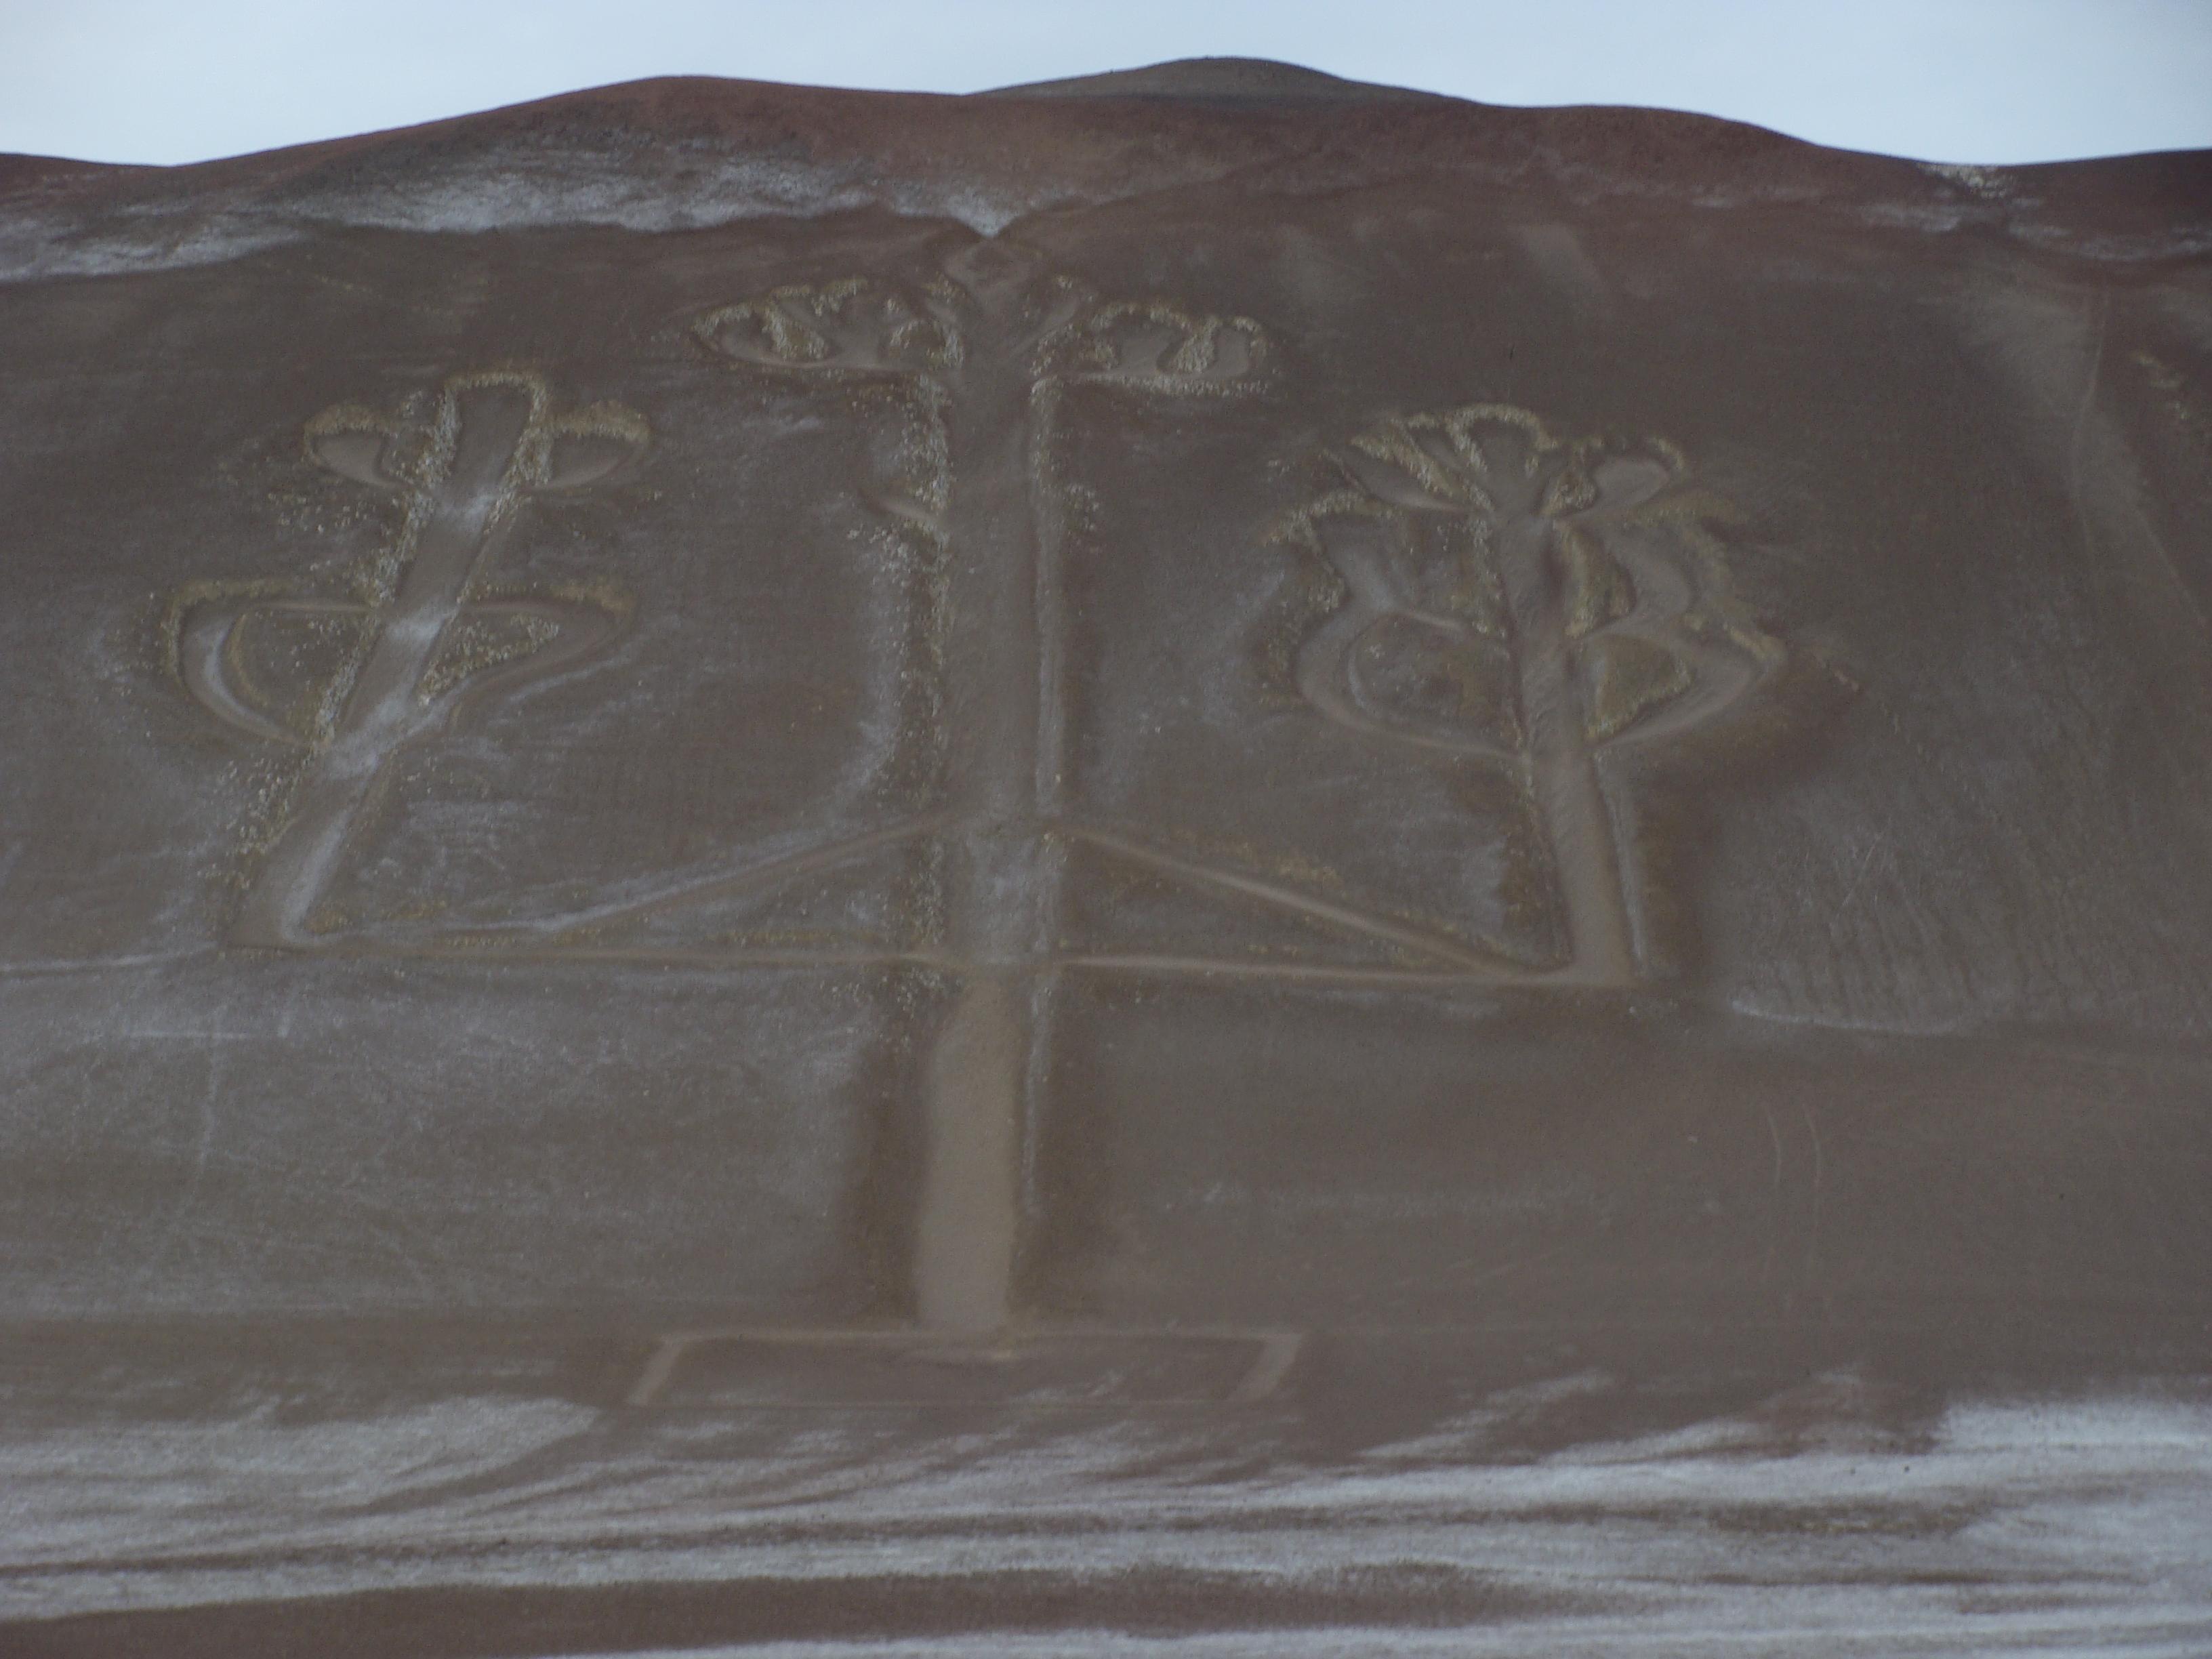 Národní Rezervace Paracas - trojzubec - zblízka 22. 2. 2011 8:25